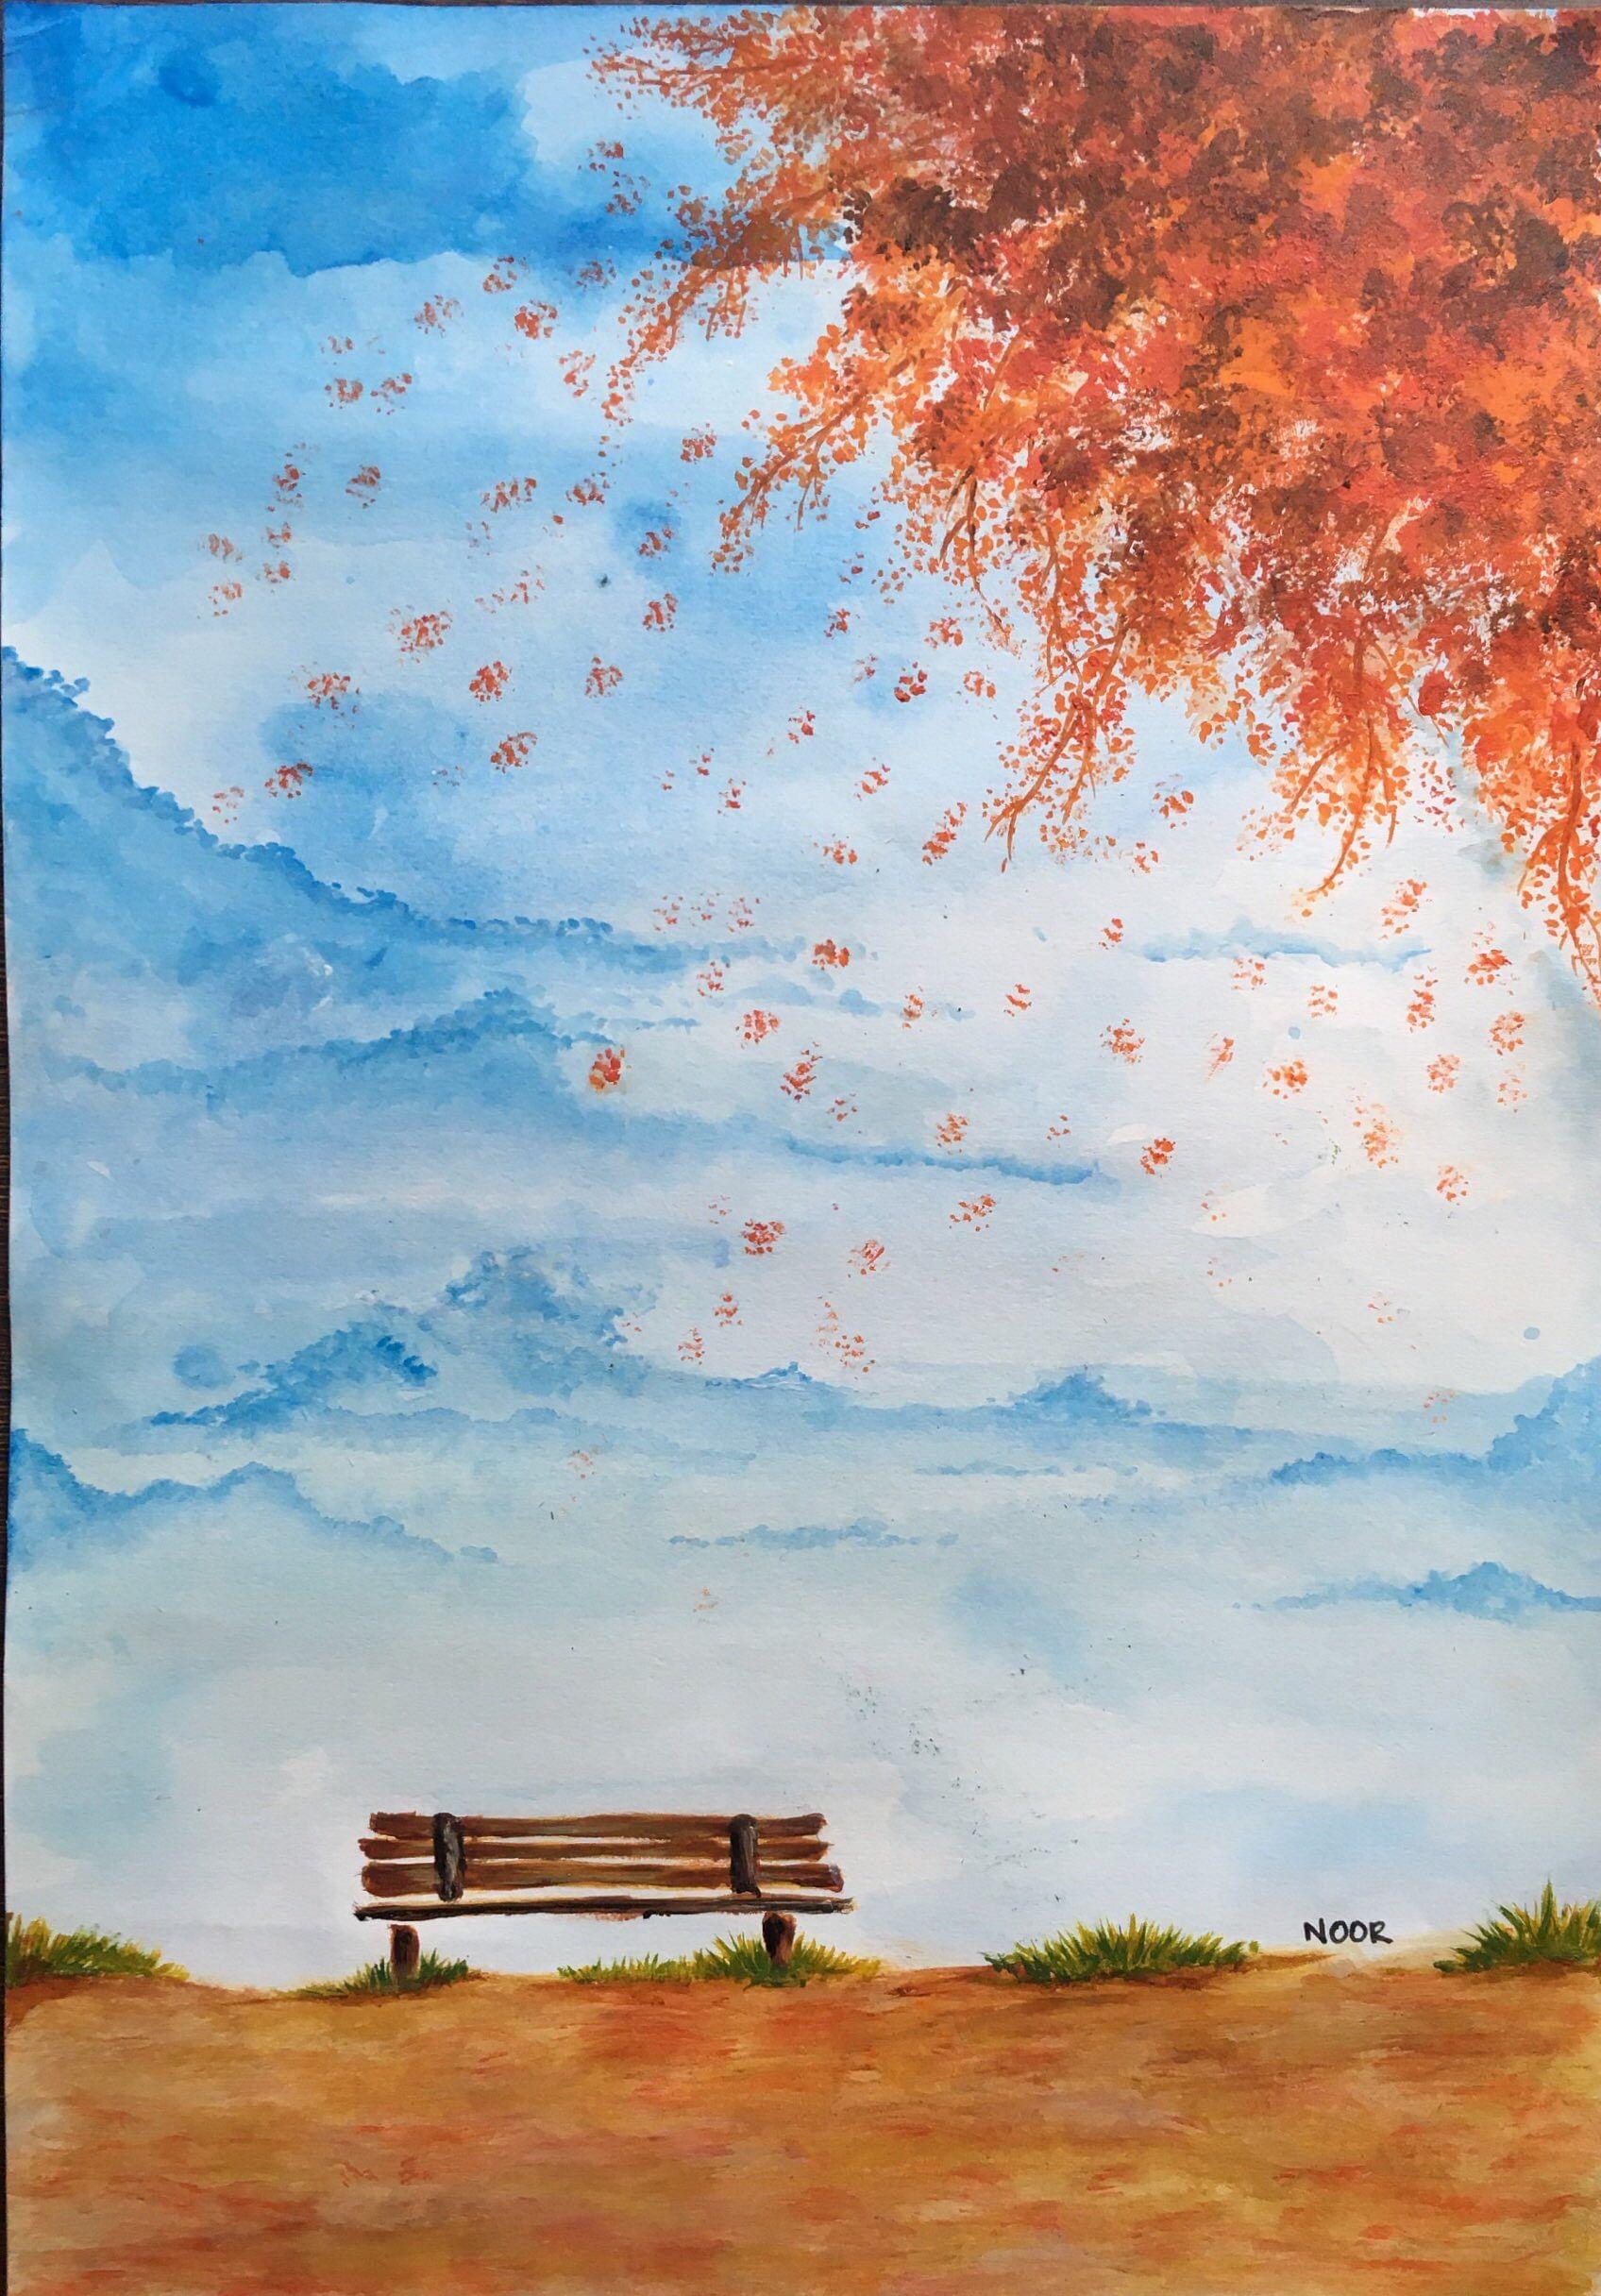 kerala ias disabled painting singing drawing noor jaleela artist